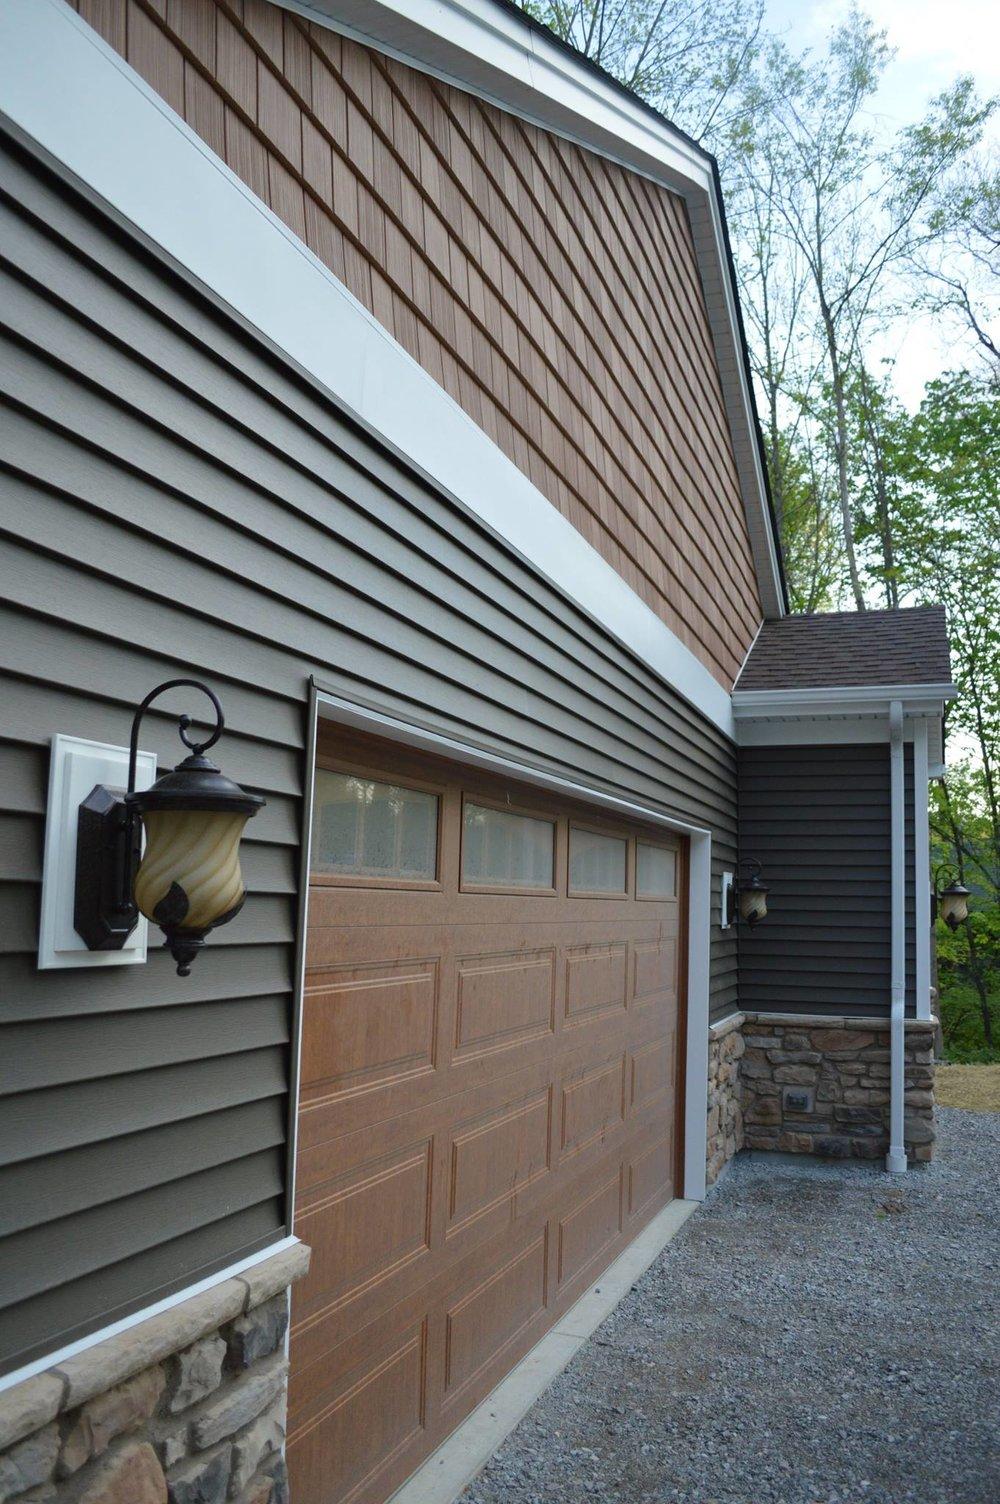 martins way sc doors in garage barron property real trail anderson glenn estate of full image